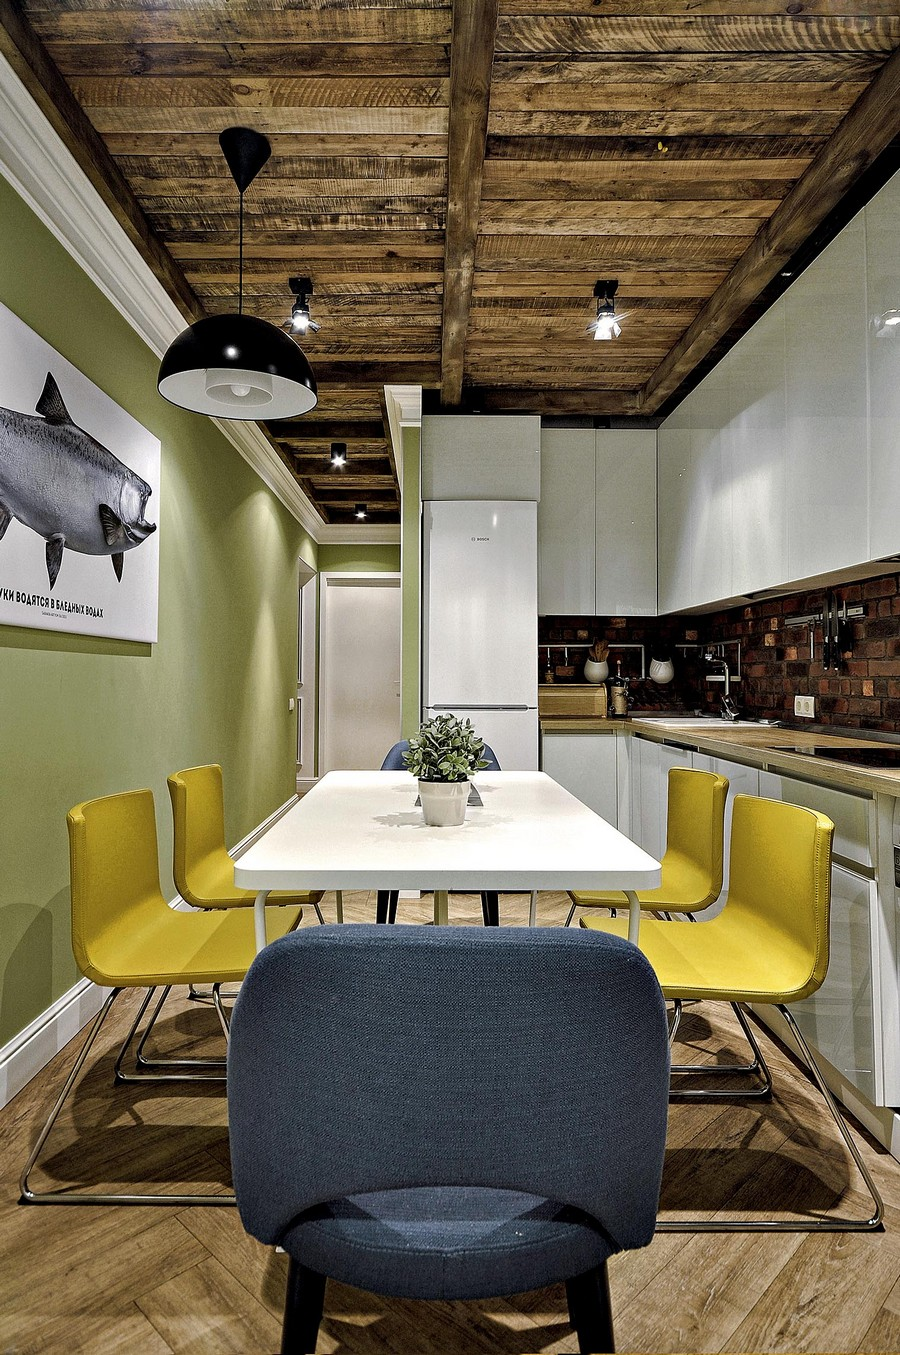 1-narrow-kitchen-interior-design-ideas-white-glossy-Scandinavian-style-handleless-cabinets-faux-brick-wall-tiles-backsplash-yellow-gray-dining-chairs-spot-lights-light-parquet-floor-herringbone-pattern-aged-wood-ceiling